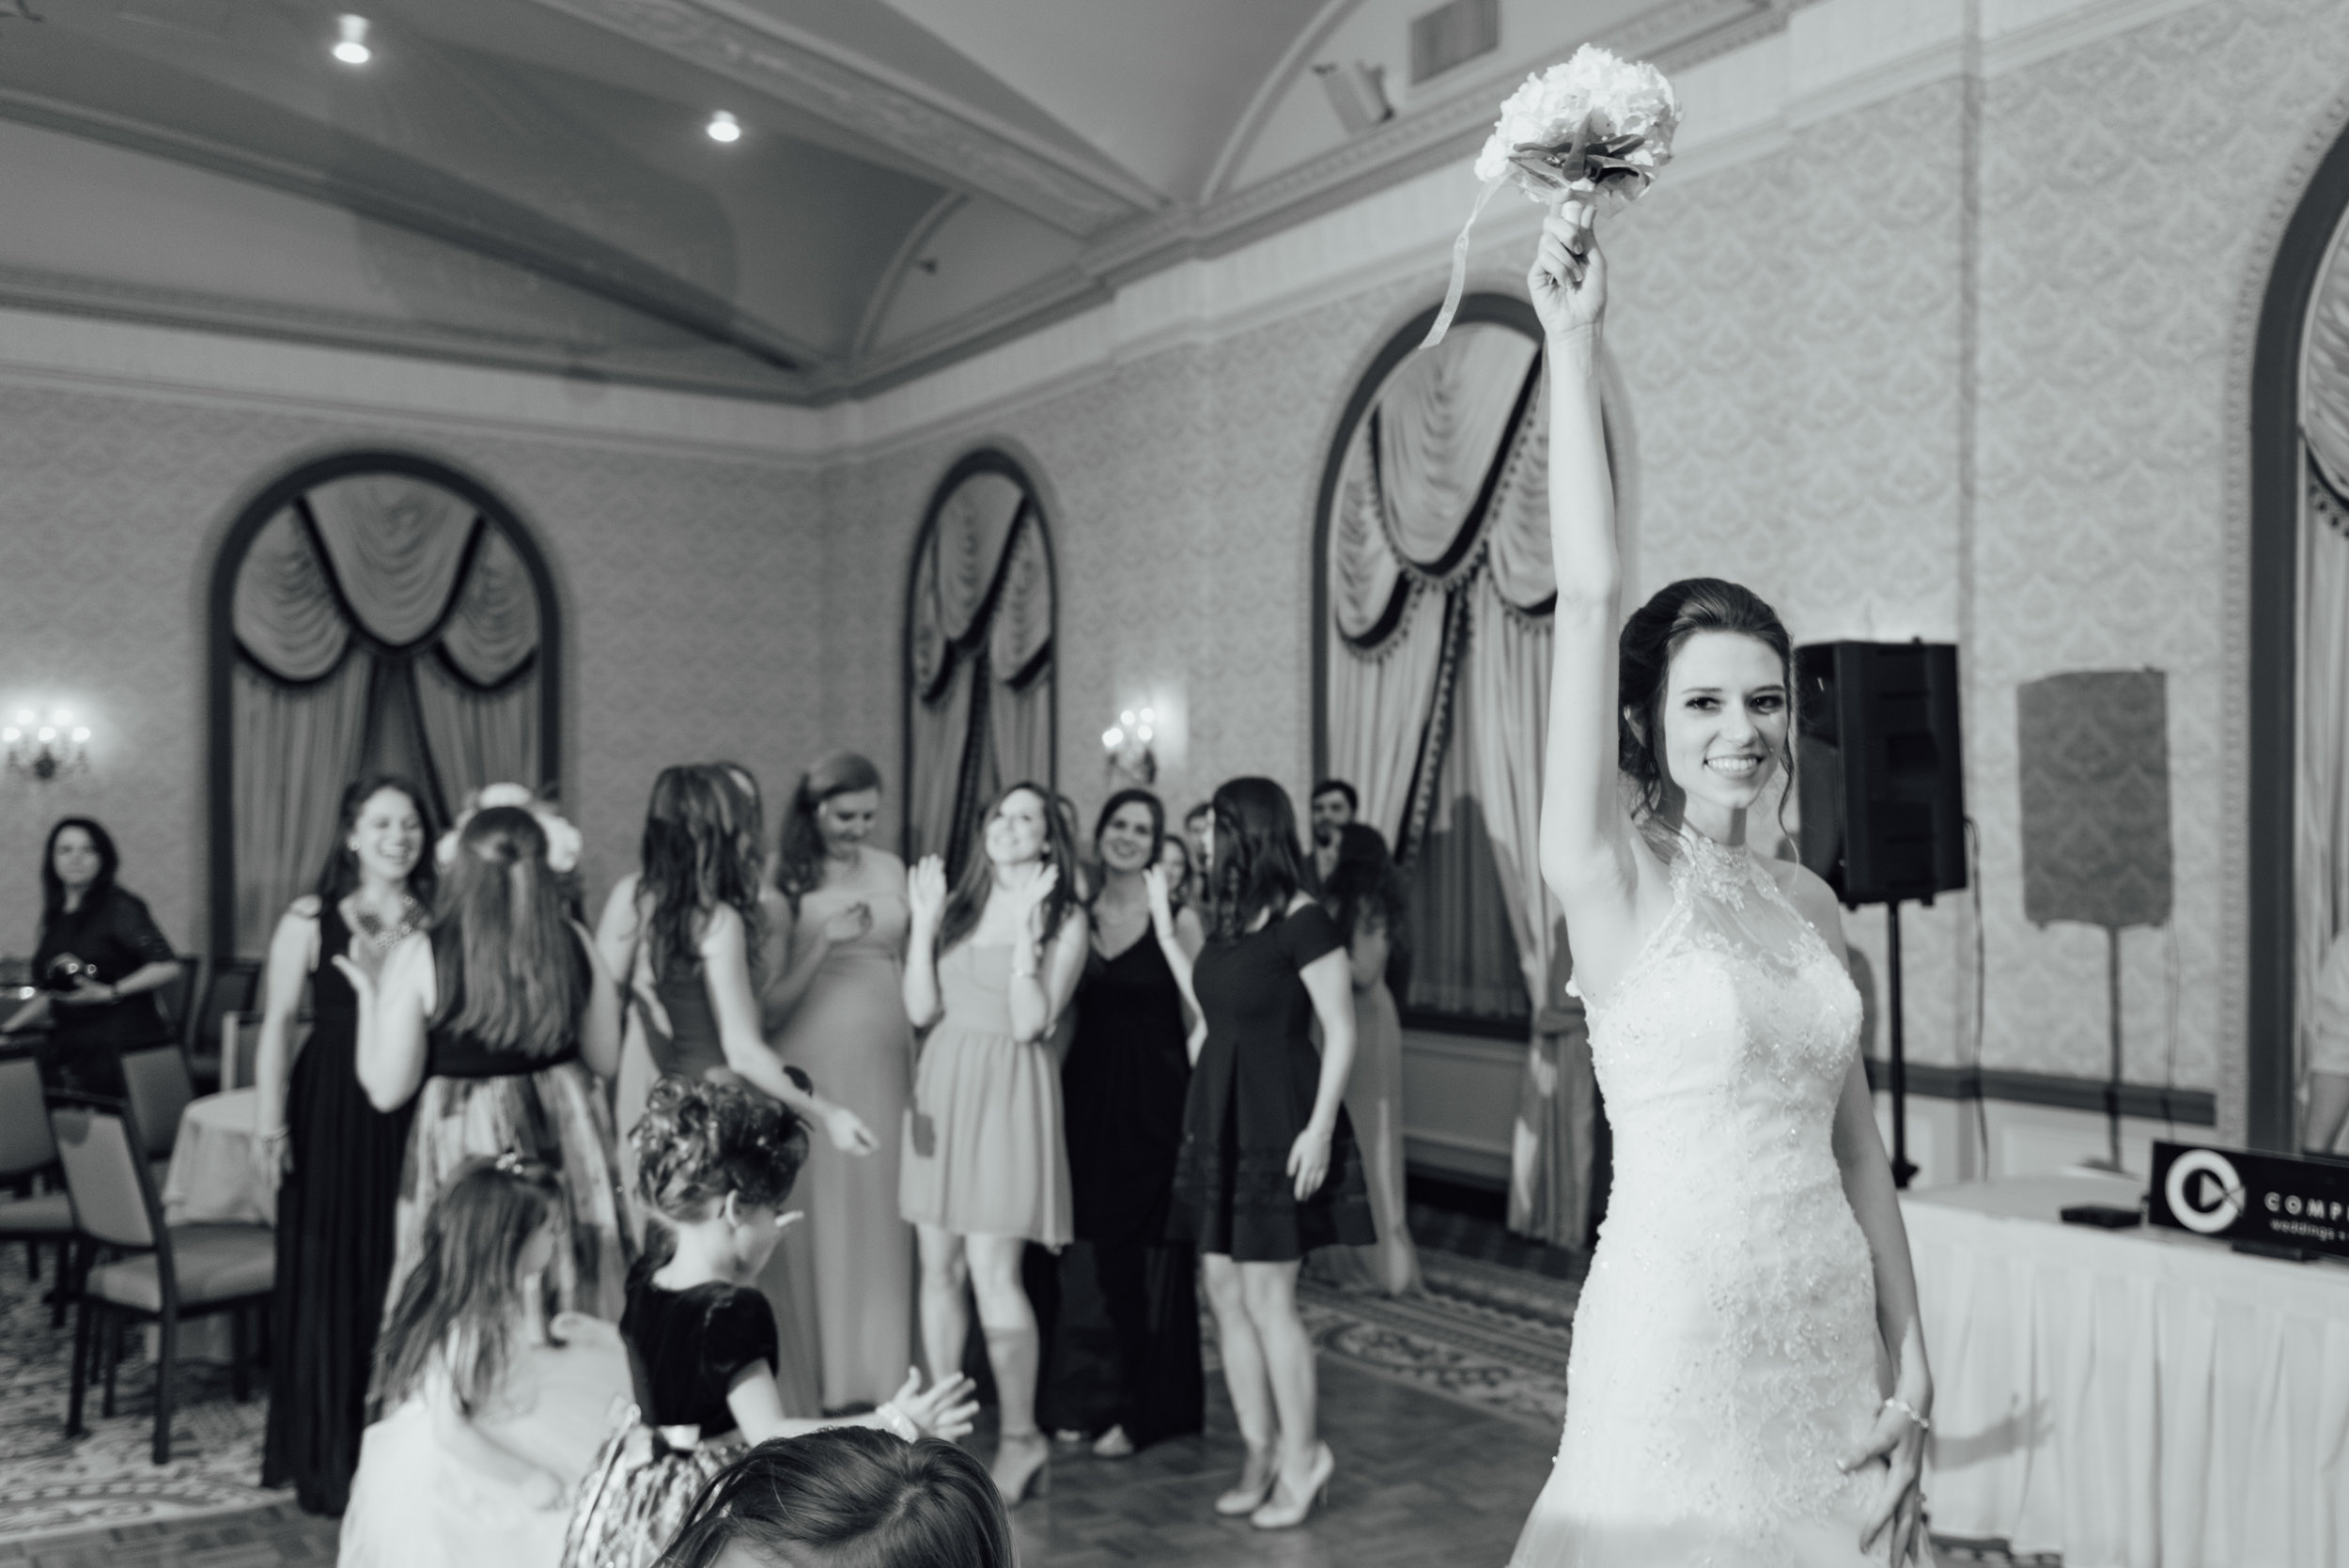 cleland-studios-wedding-photography-70.jpg